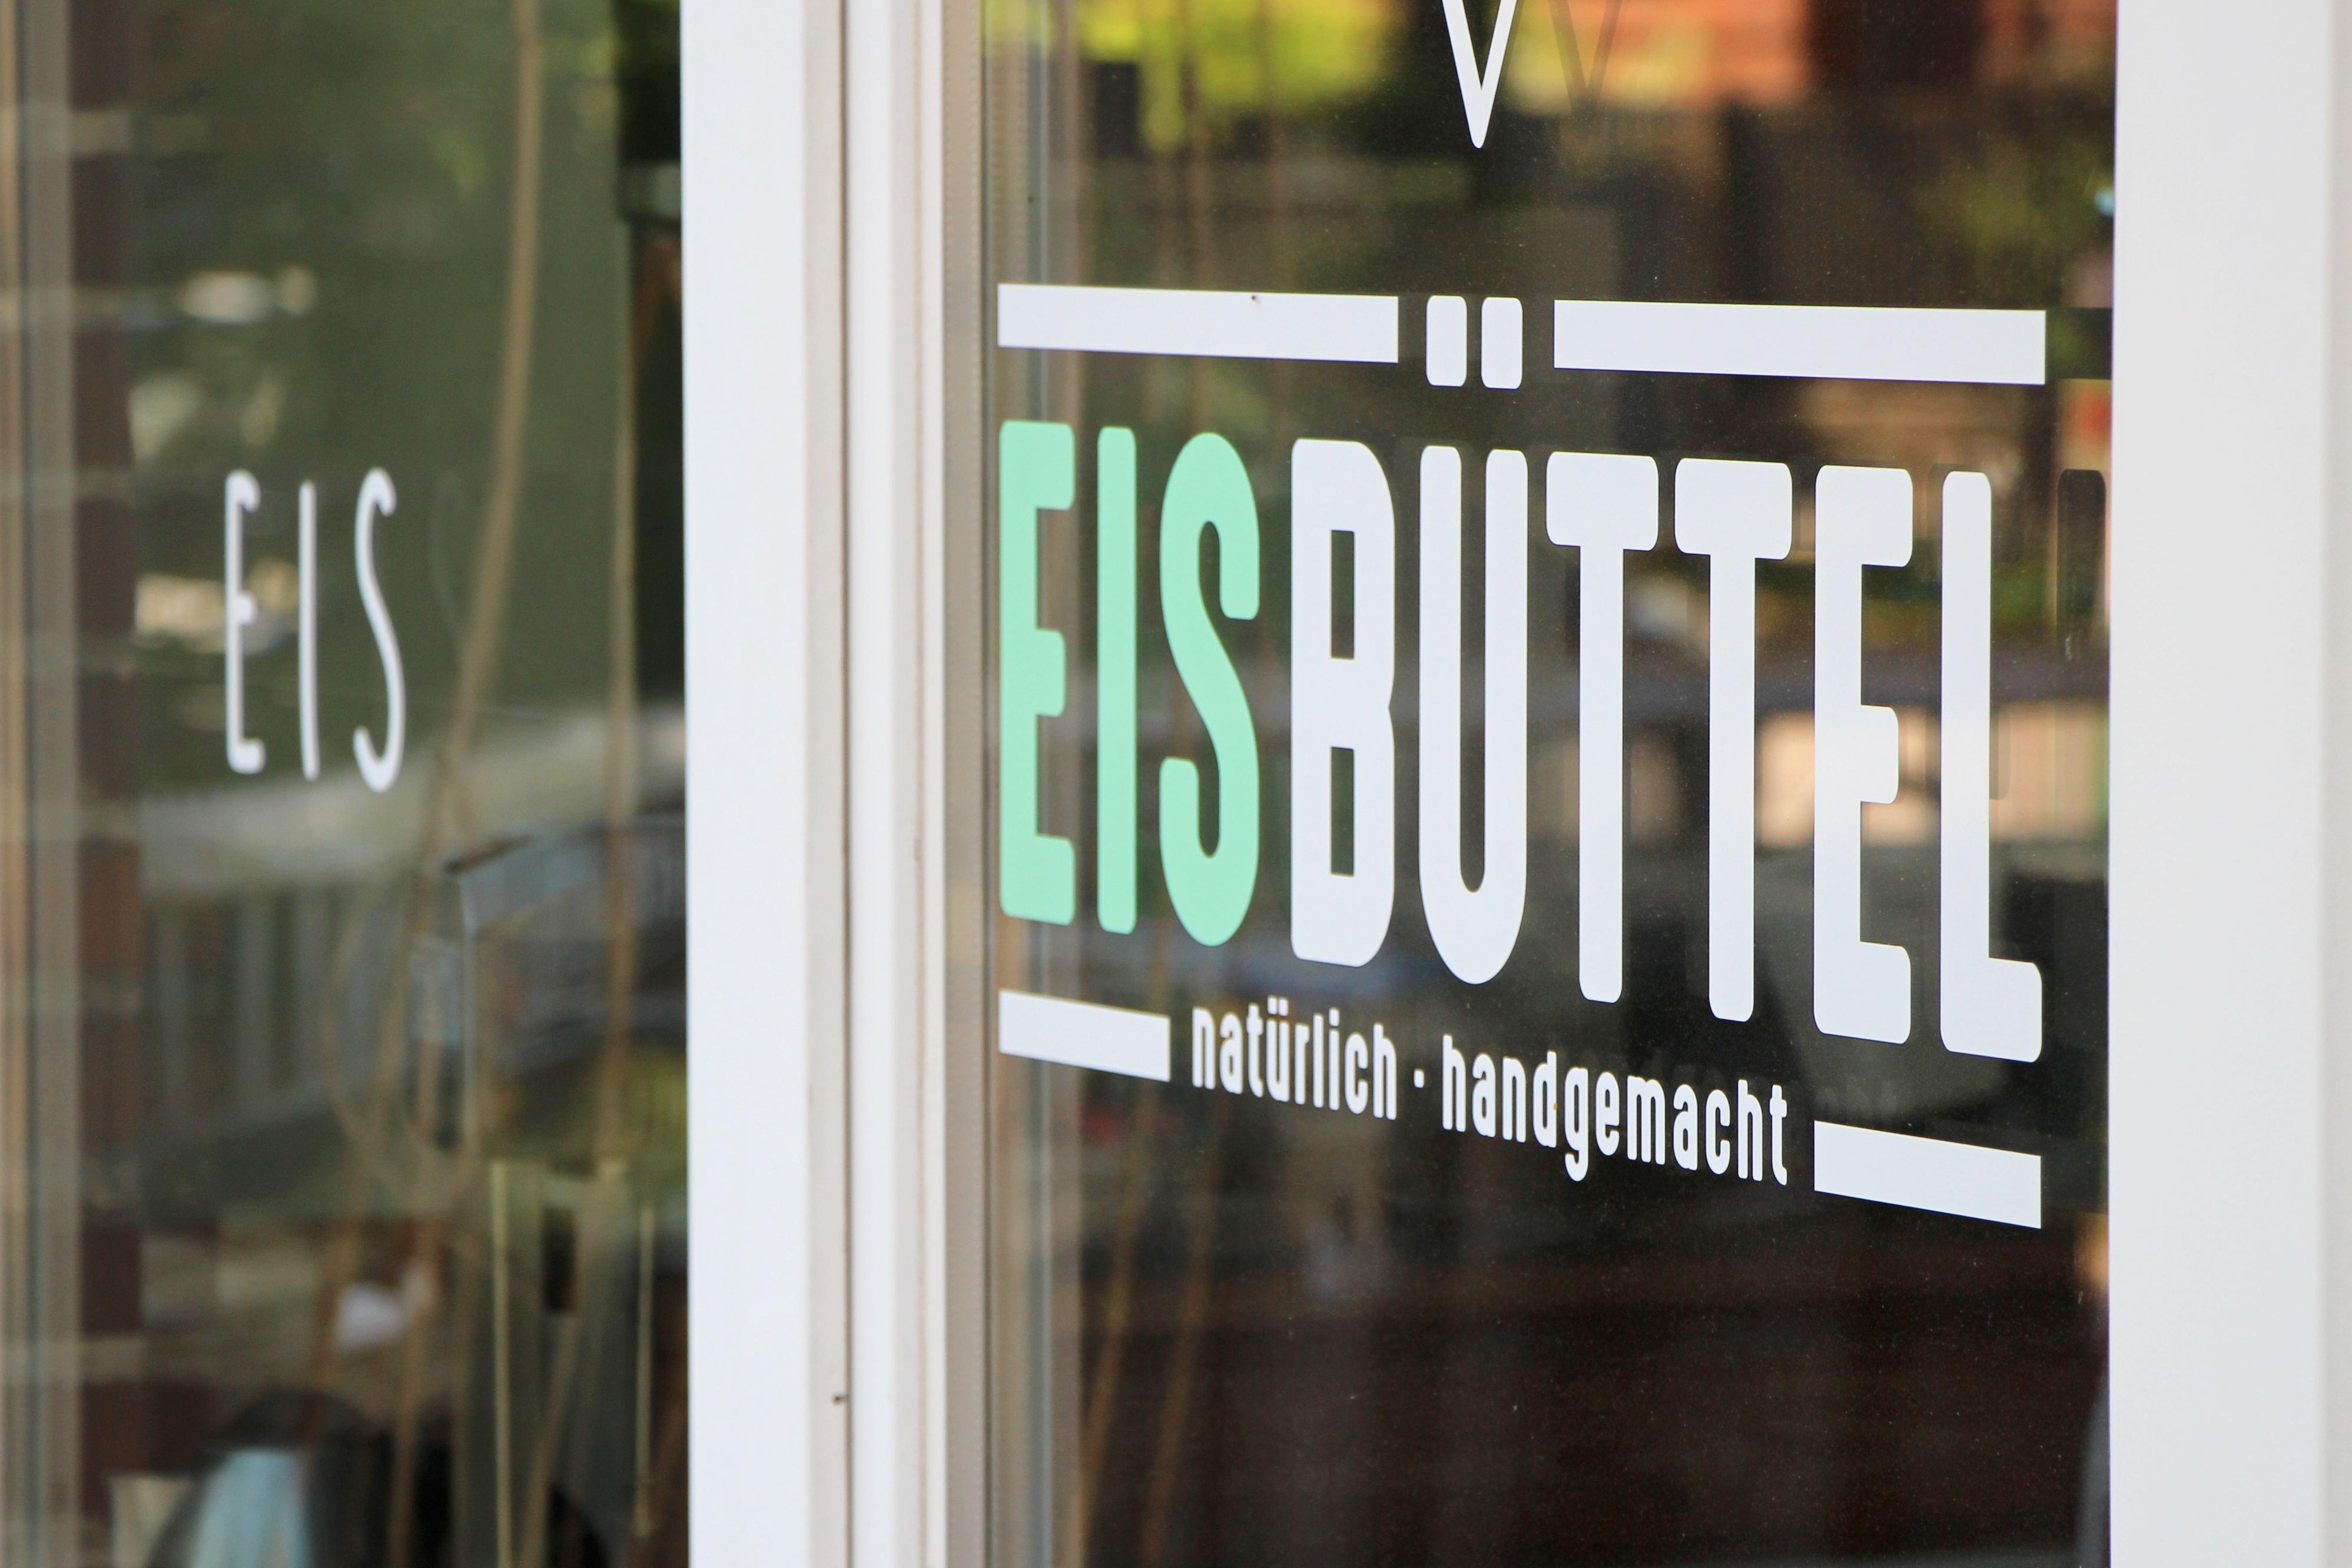 """Eisbüttel"": Neue Eisdiele in der Lutterothstraße"